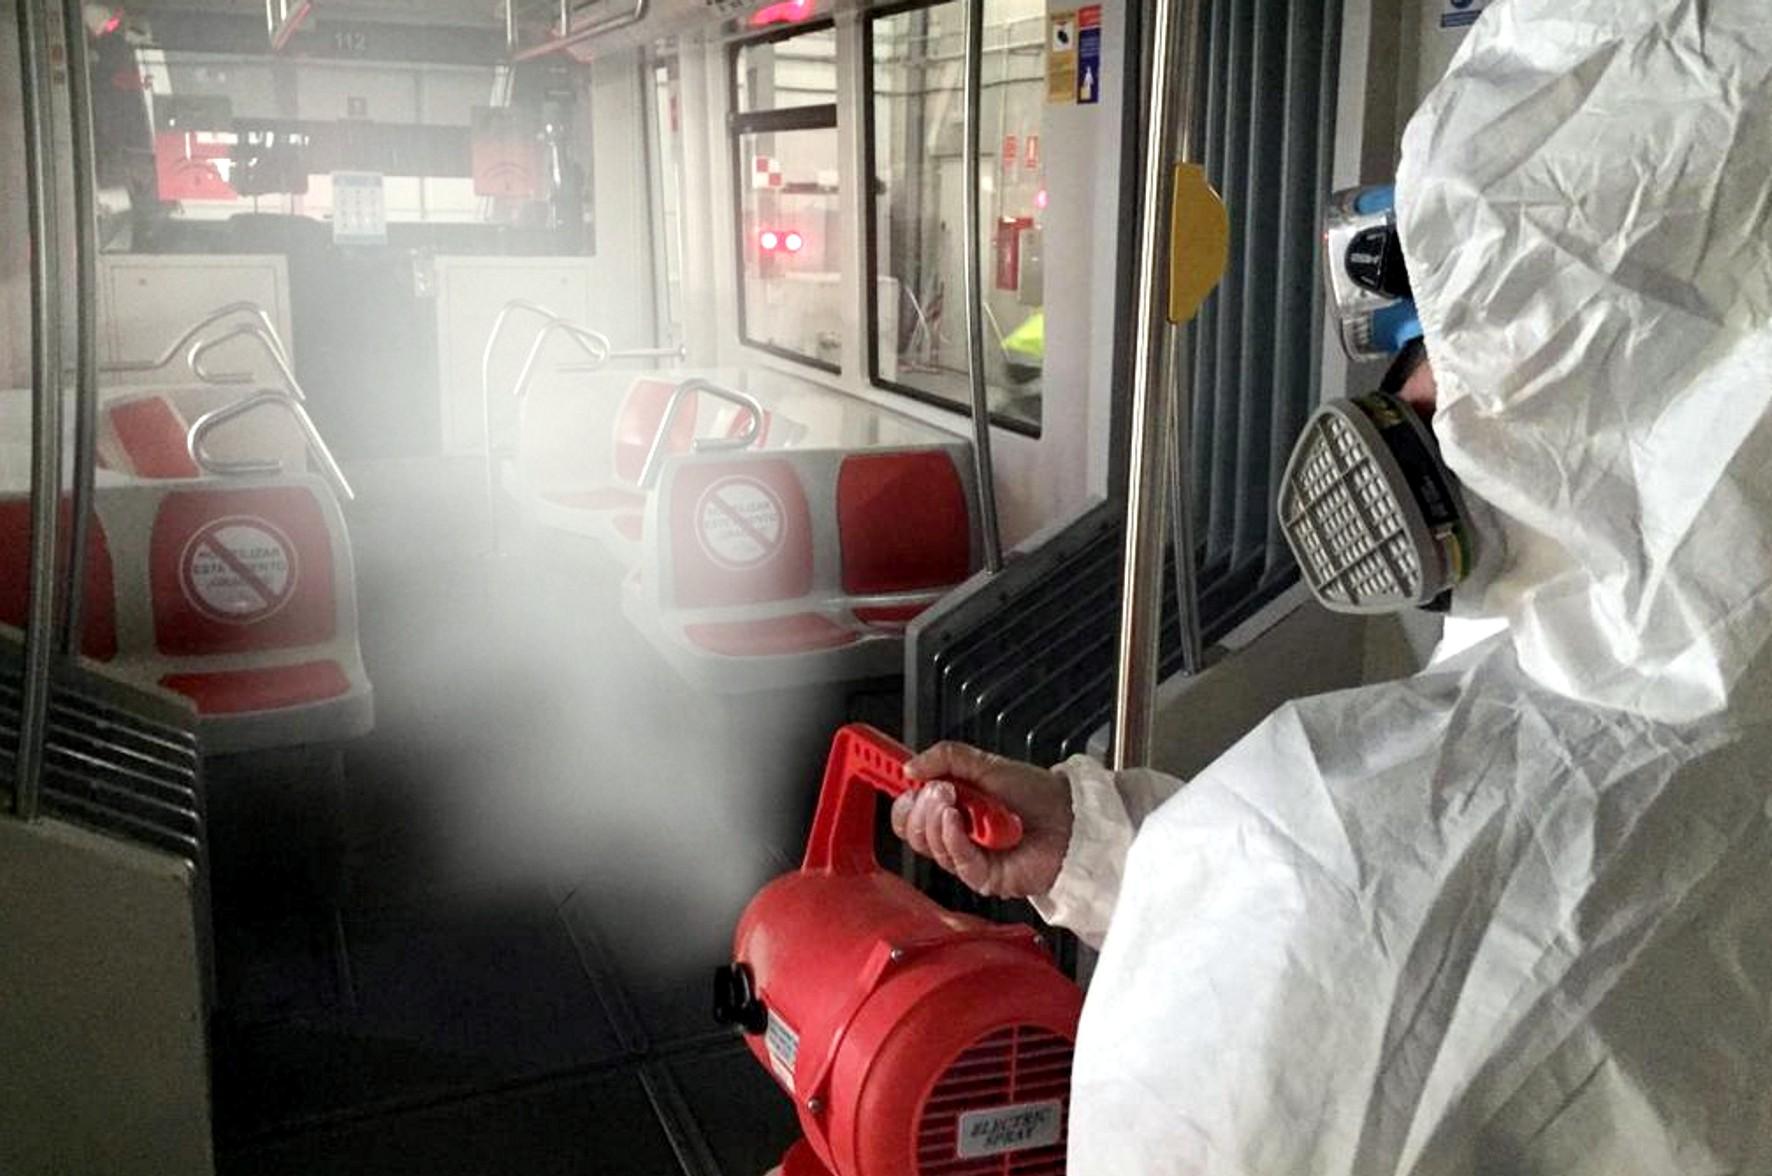 Metro de Sevilla aplica una desinfección con microgotas que llega a zonas de difícil acceso